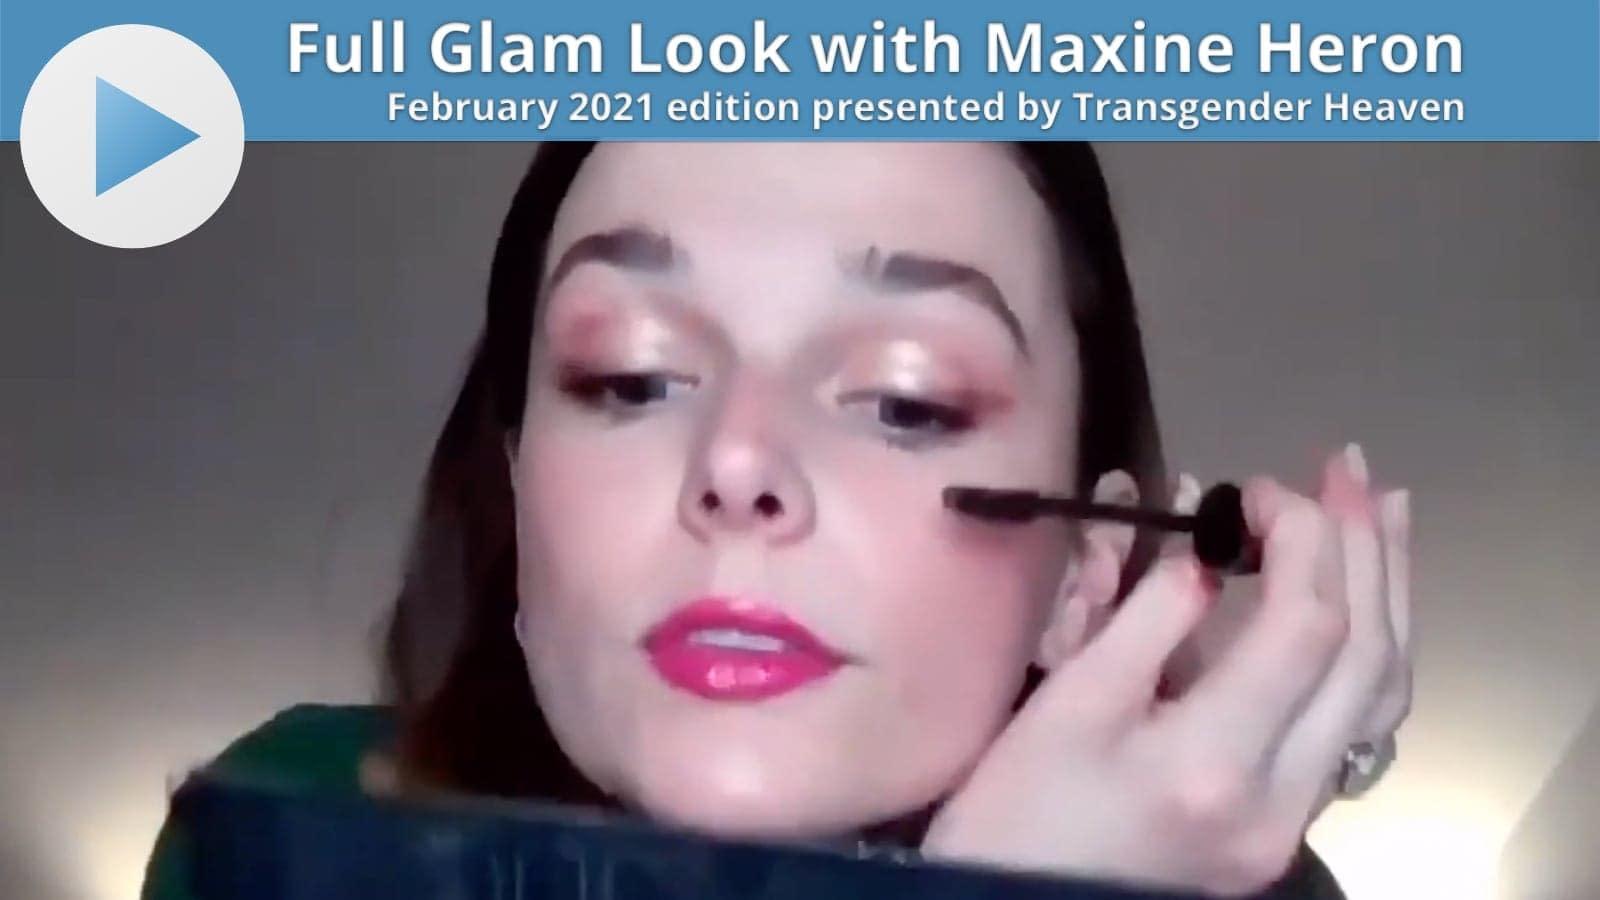 Full Glam Look